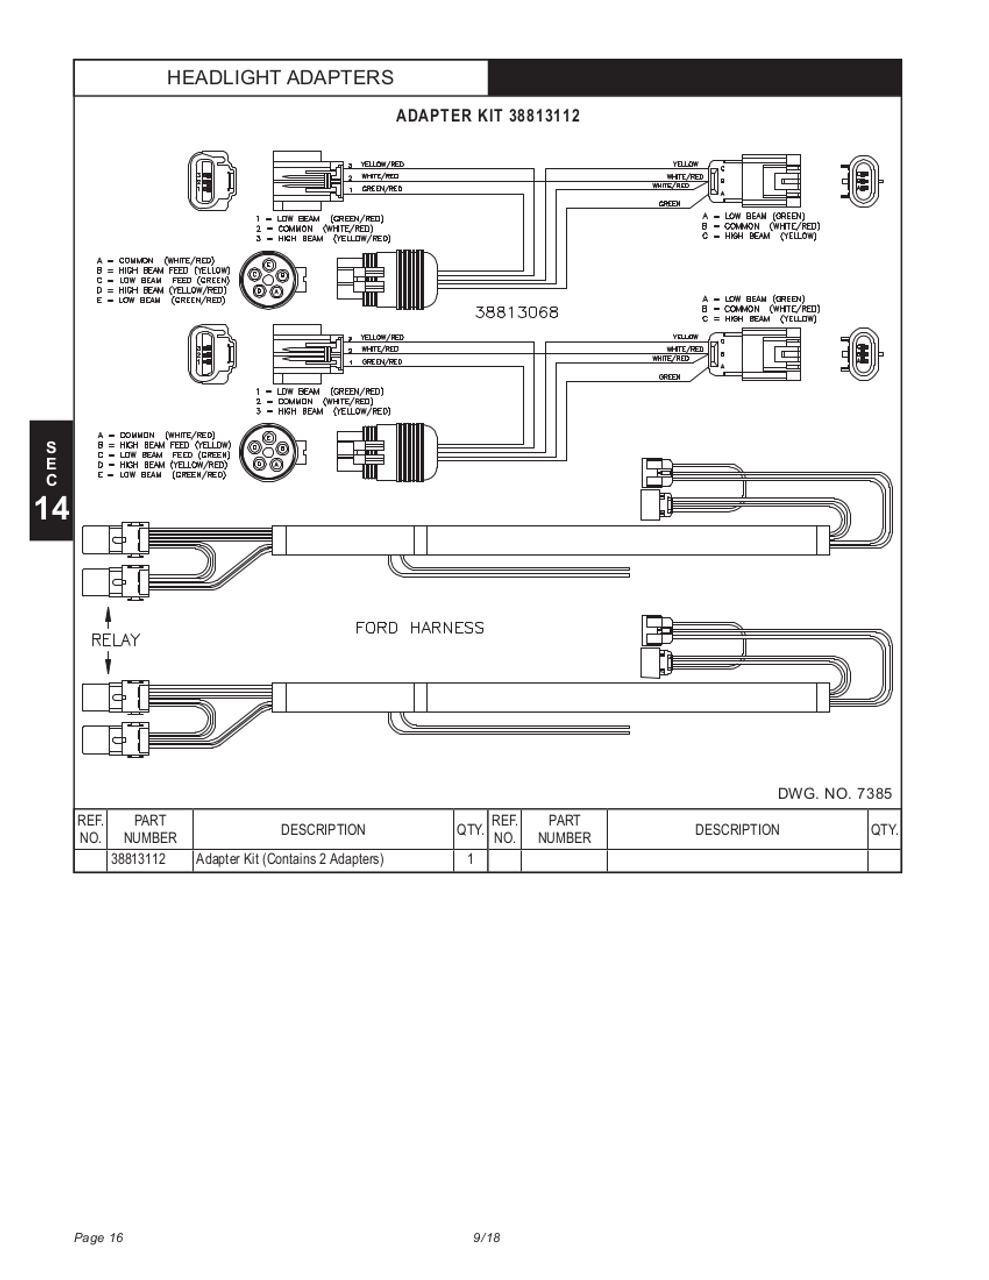 HN38813122 --- Hiniker Headlight Adapter Kit